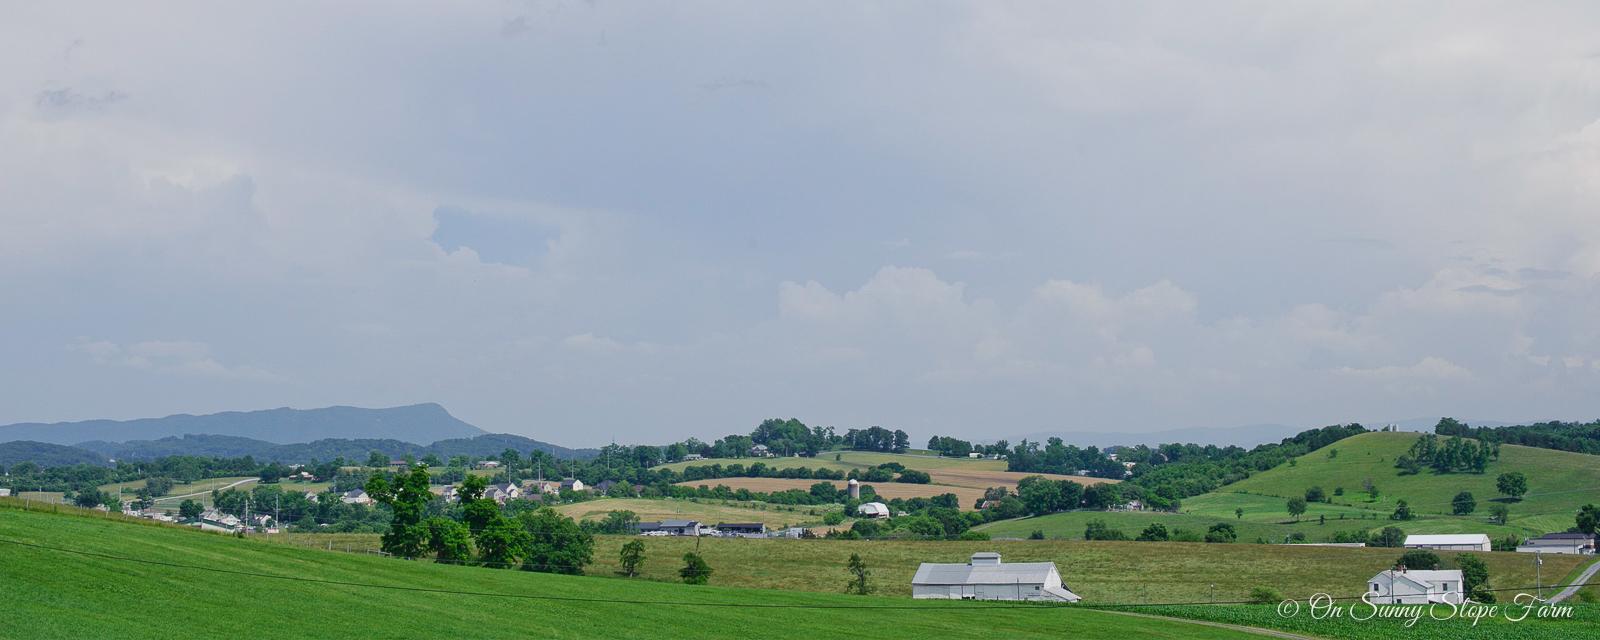 views-on-sunny-slope-farm-2